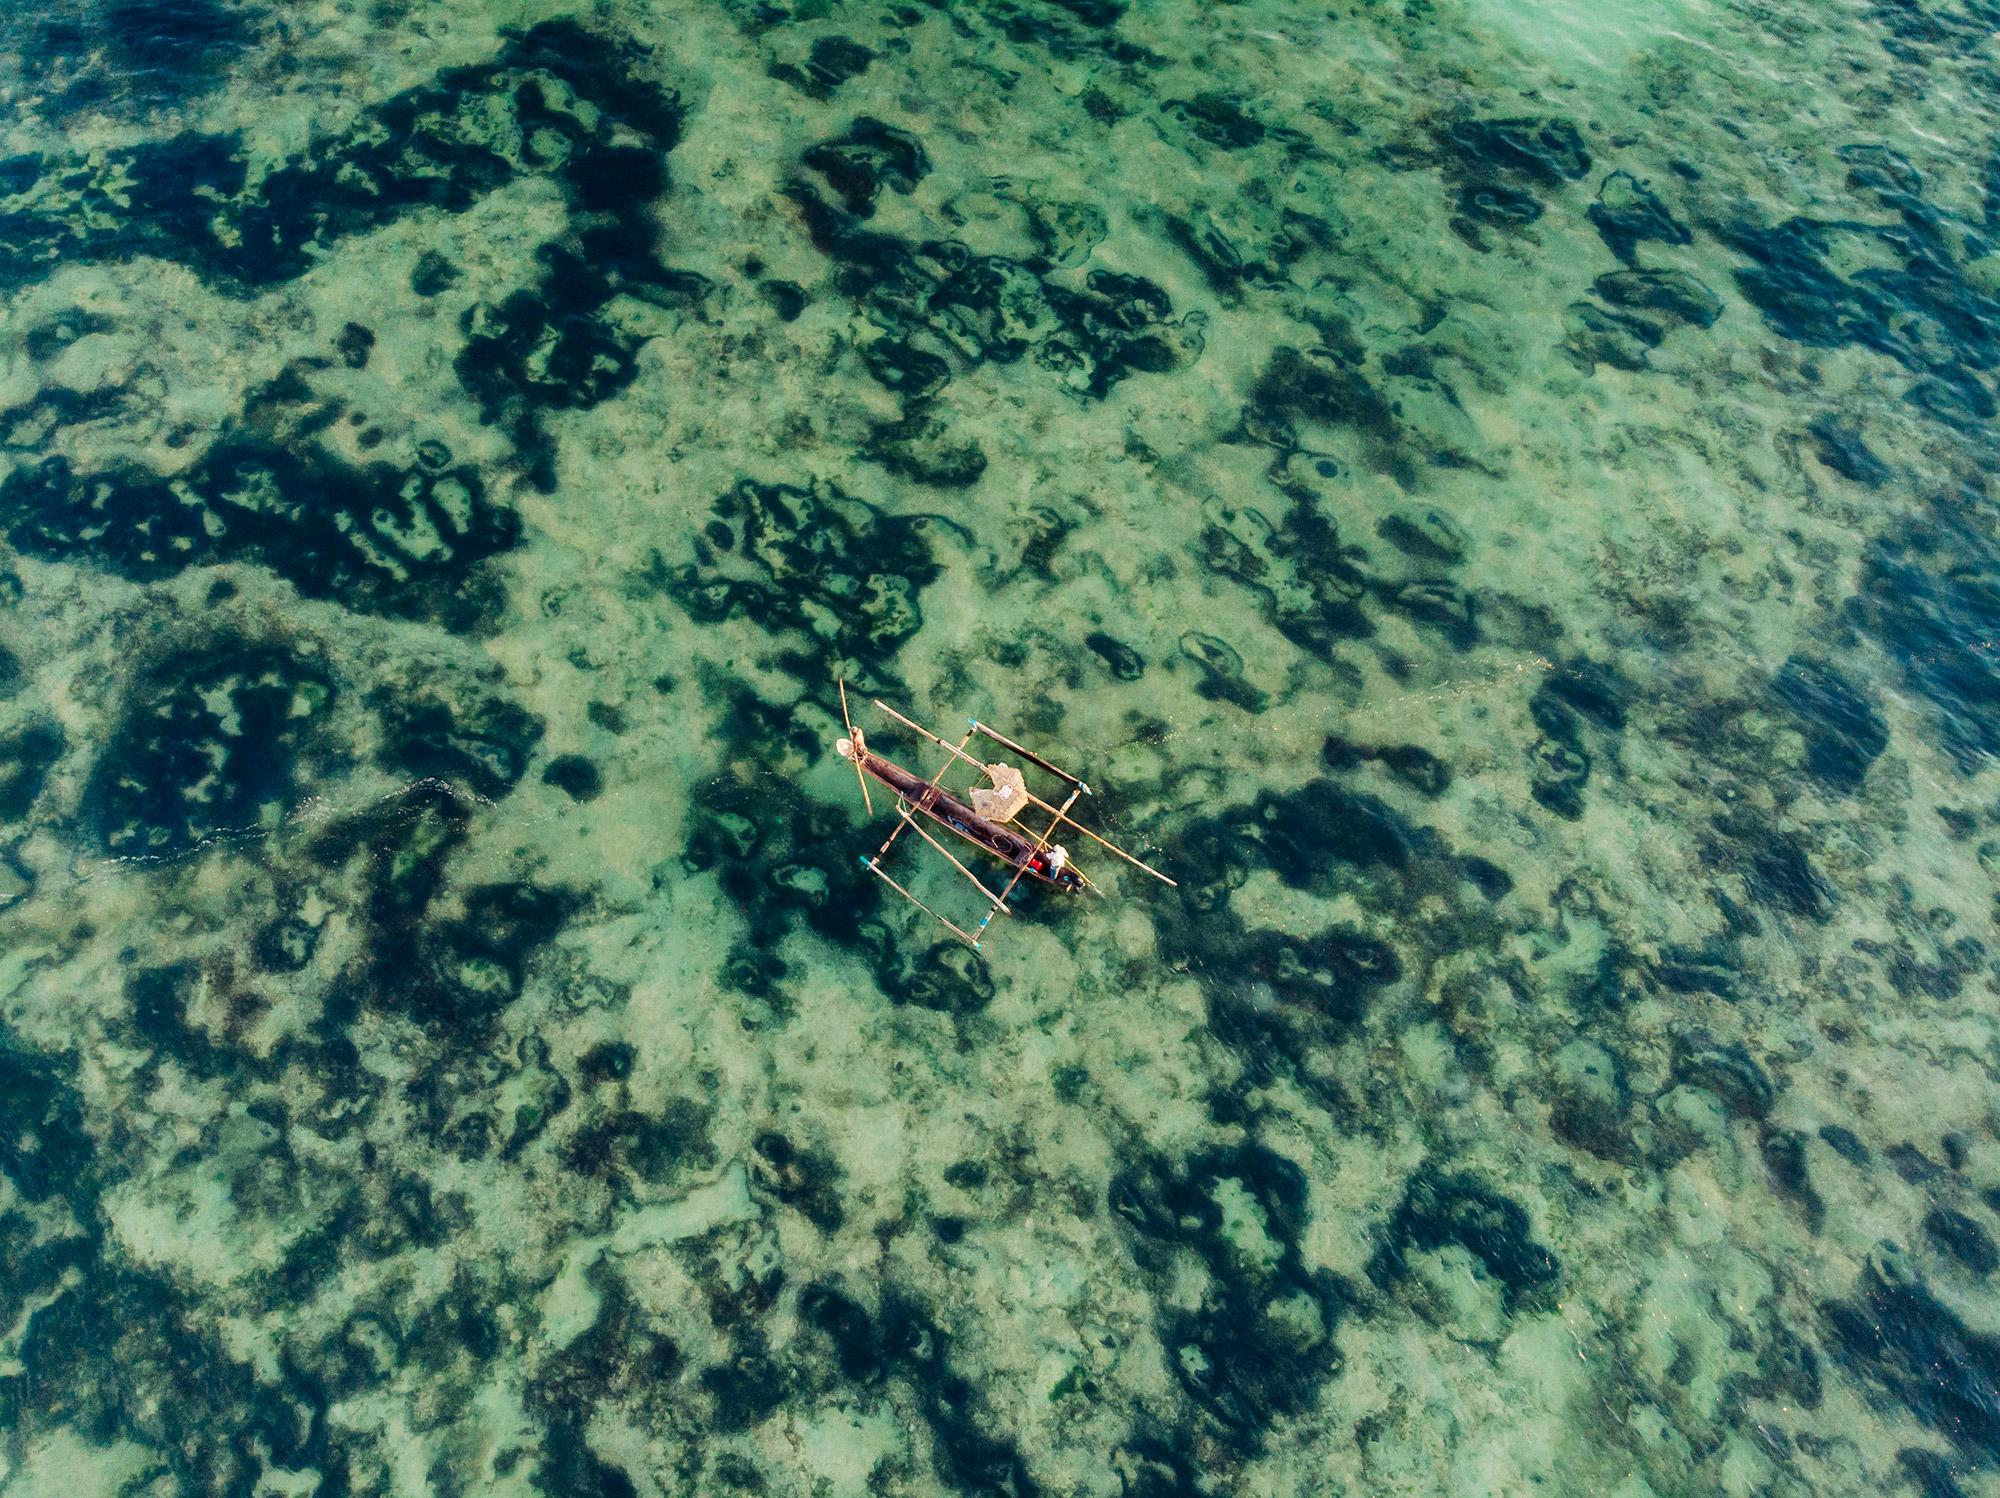 APitts_Condor_Zanzibar_190.jpg